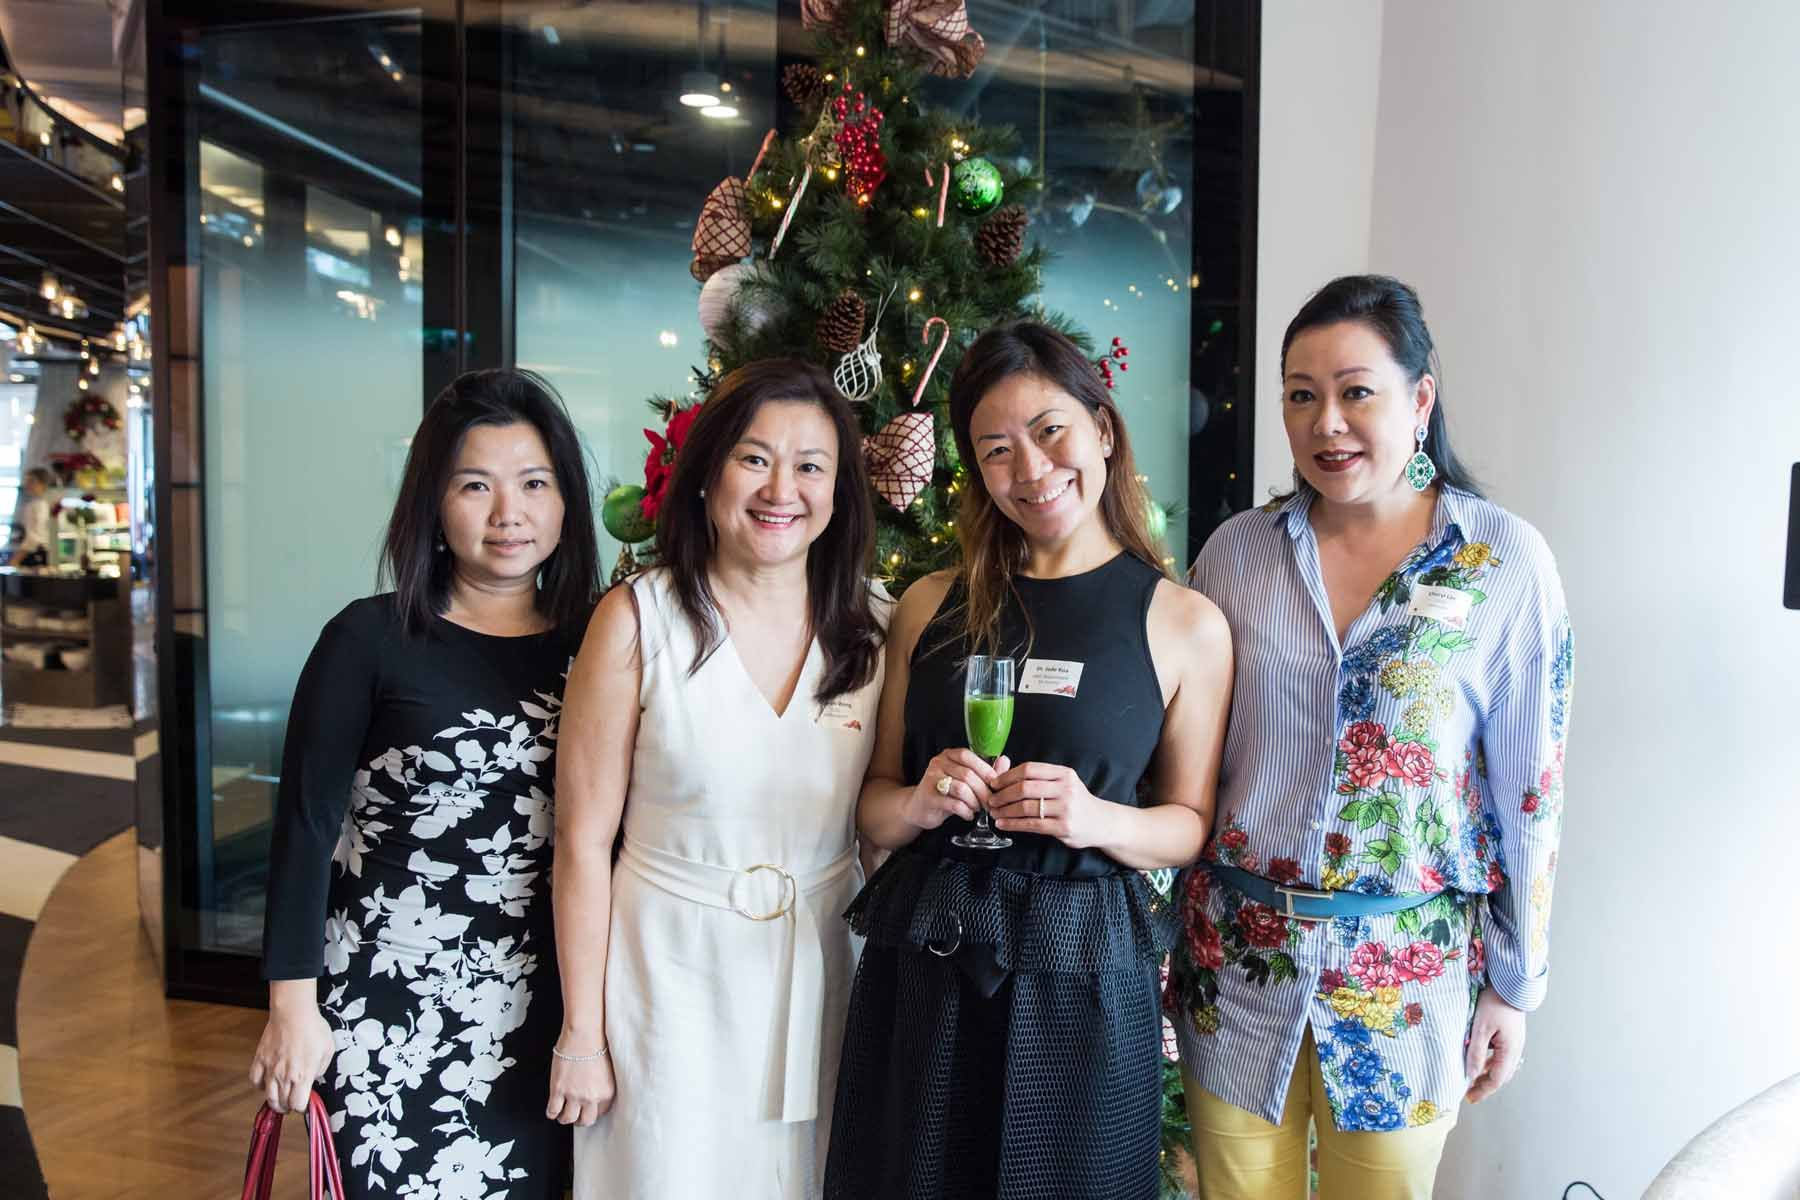 Julie Haw, Sharon Wong, Jade Kua, Cheryl Lee